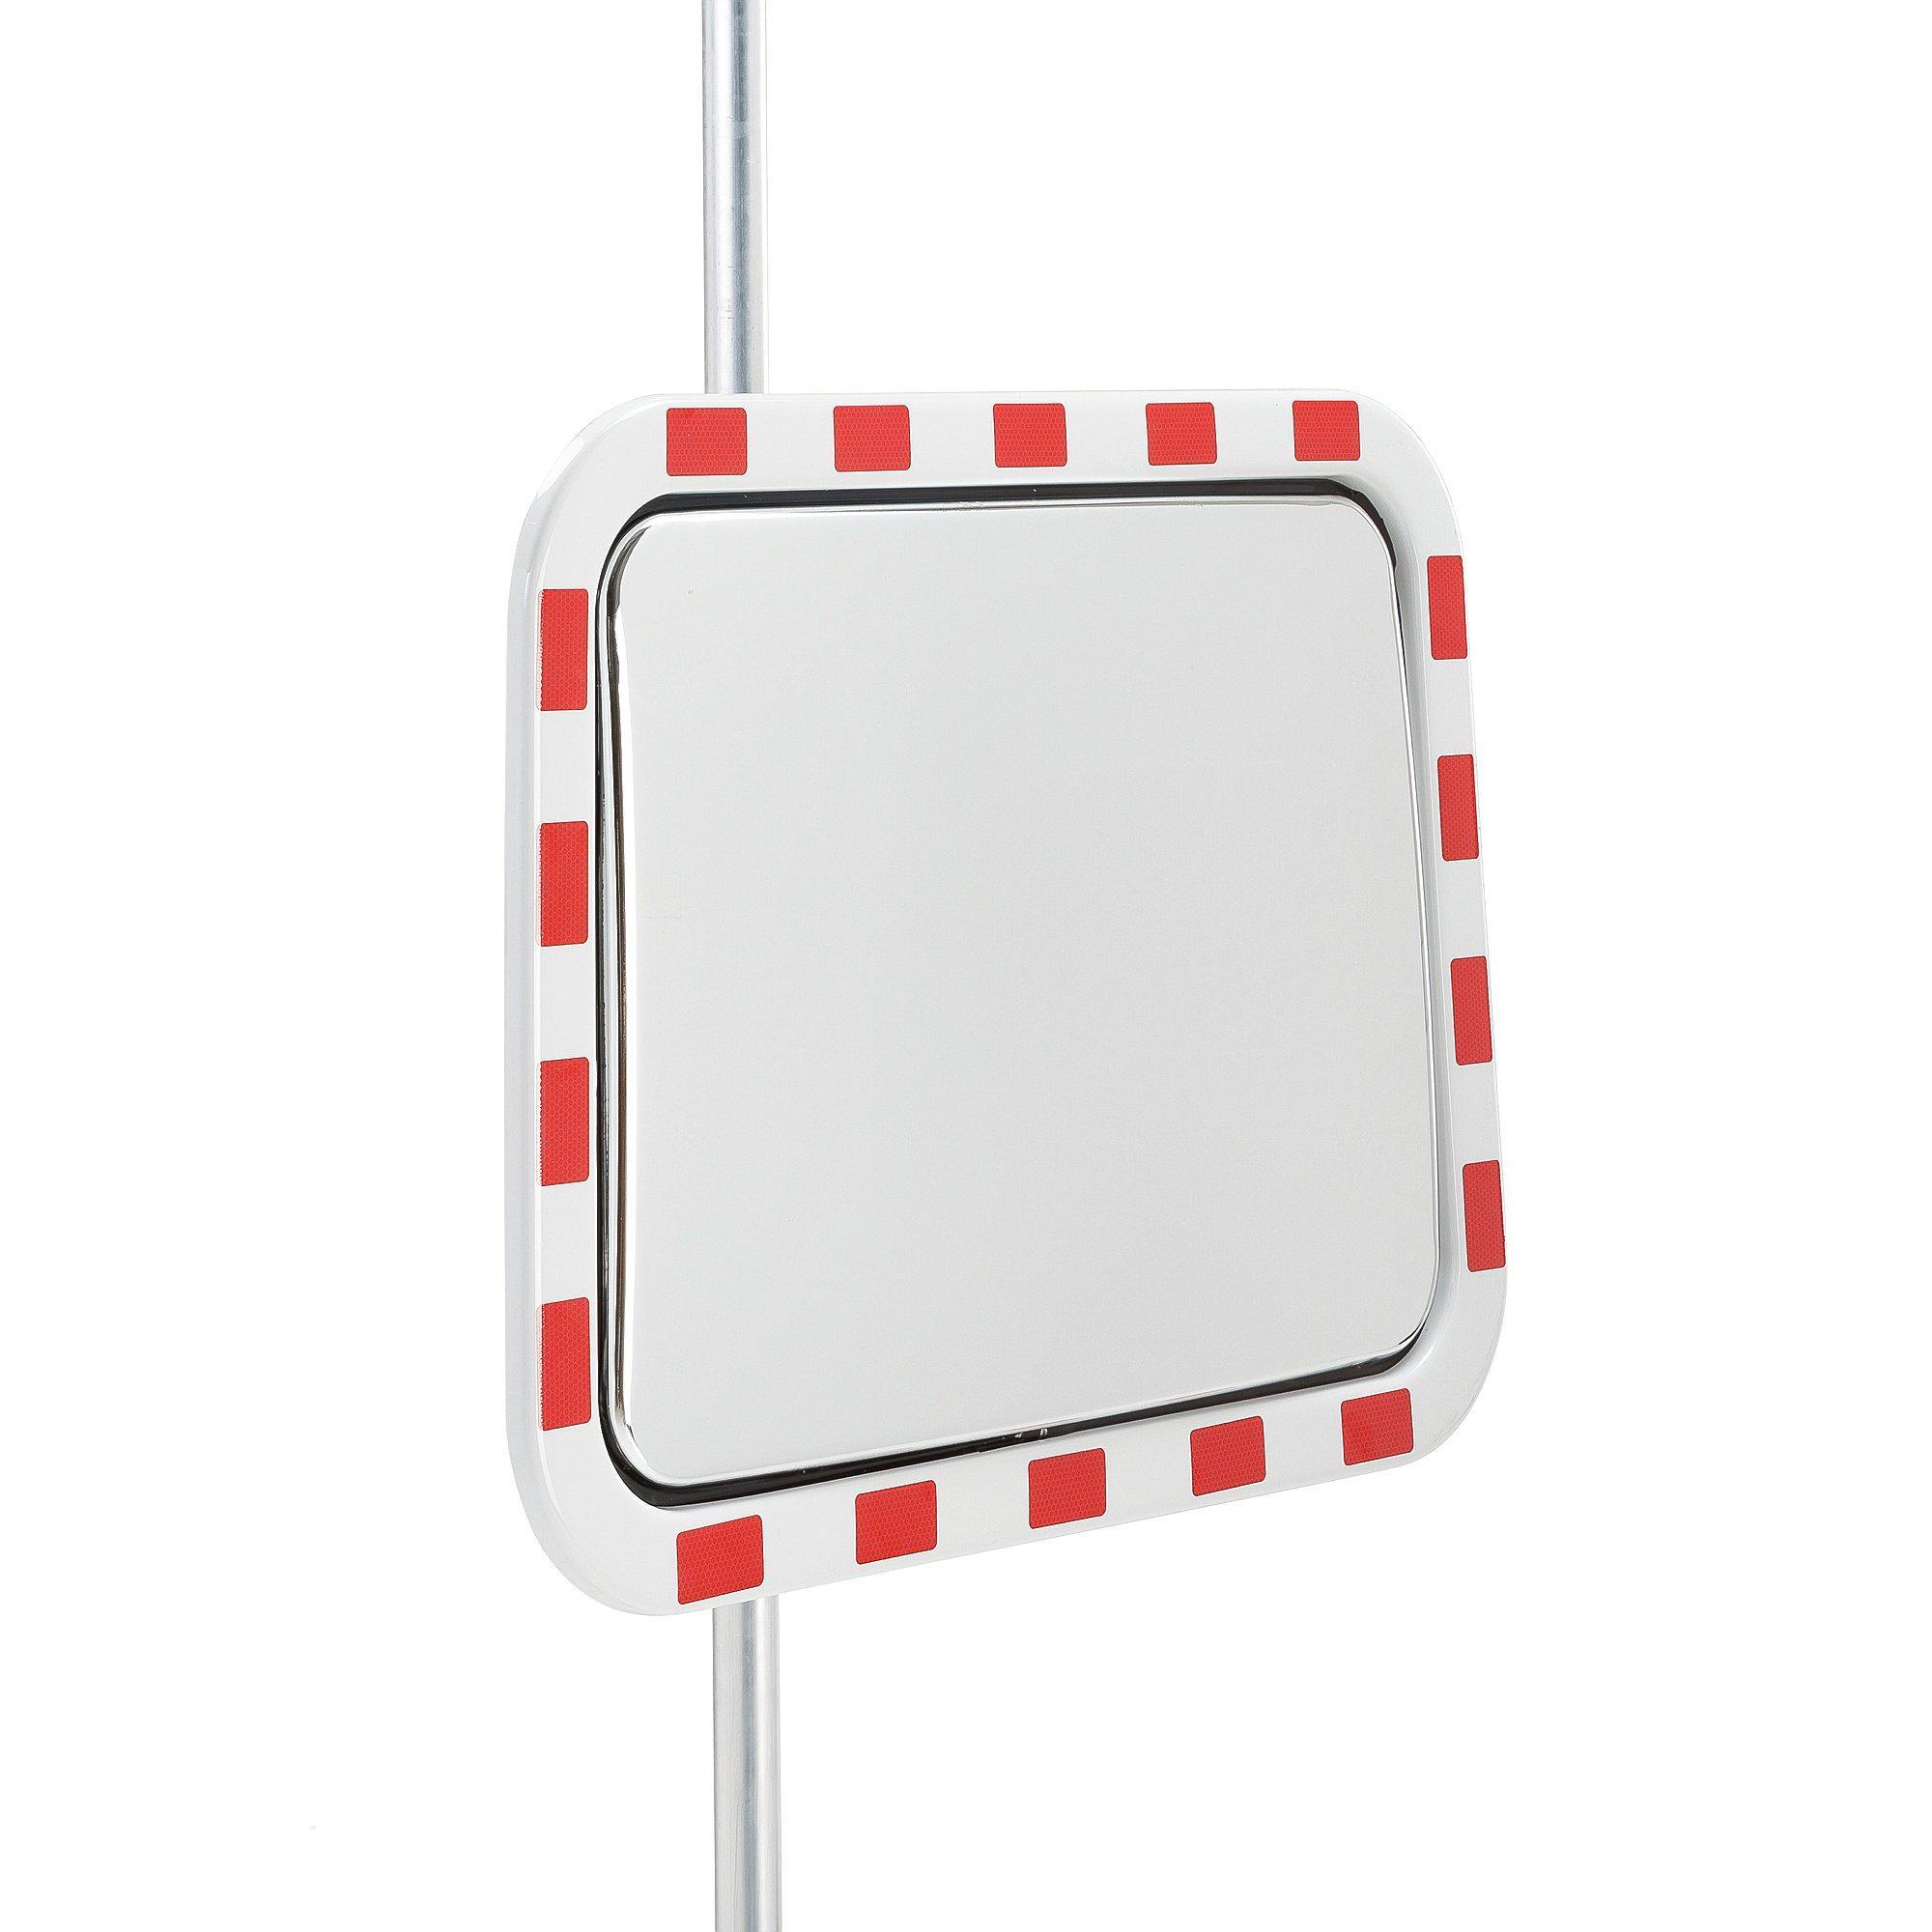 Bezpečnostné priemyselné zrkadlo, 800x600 mm